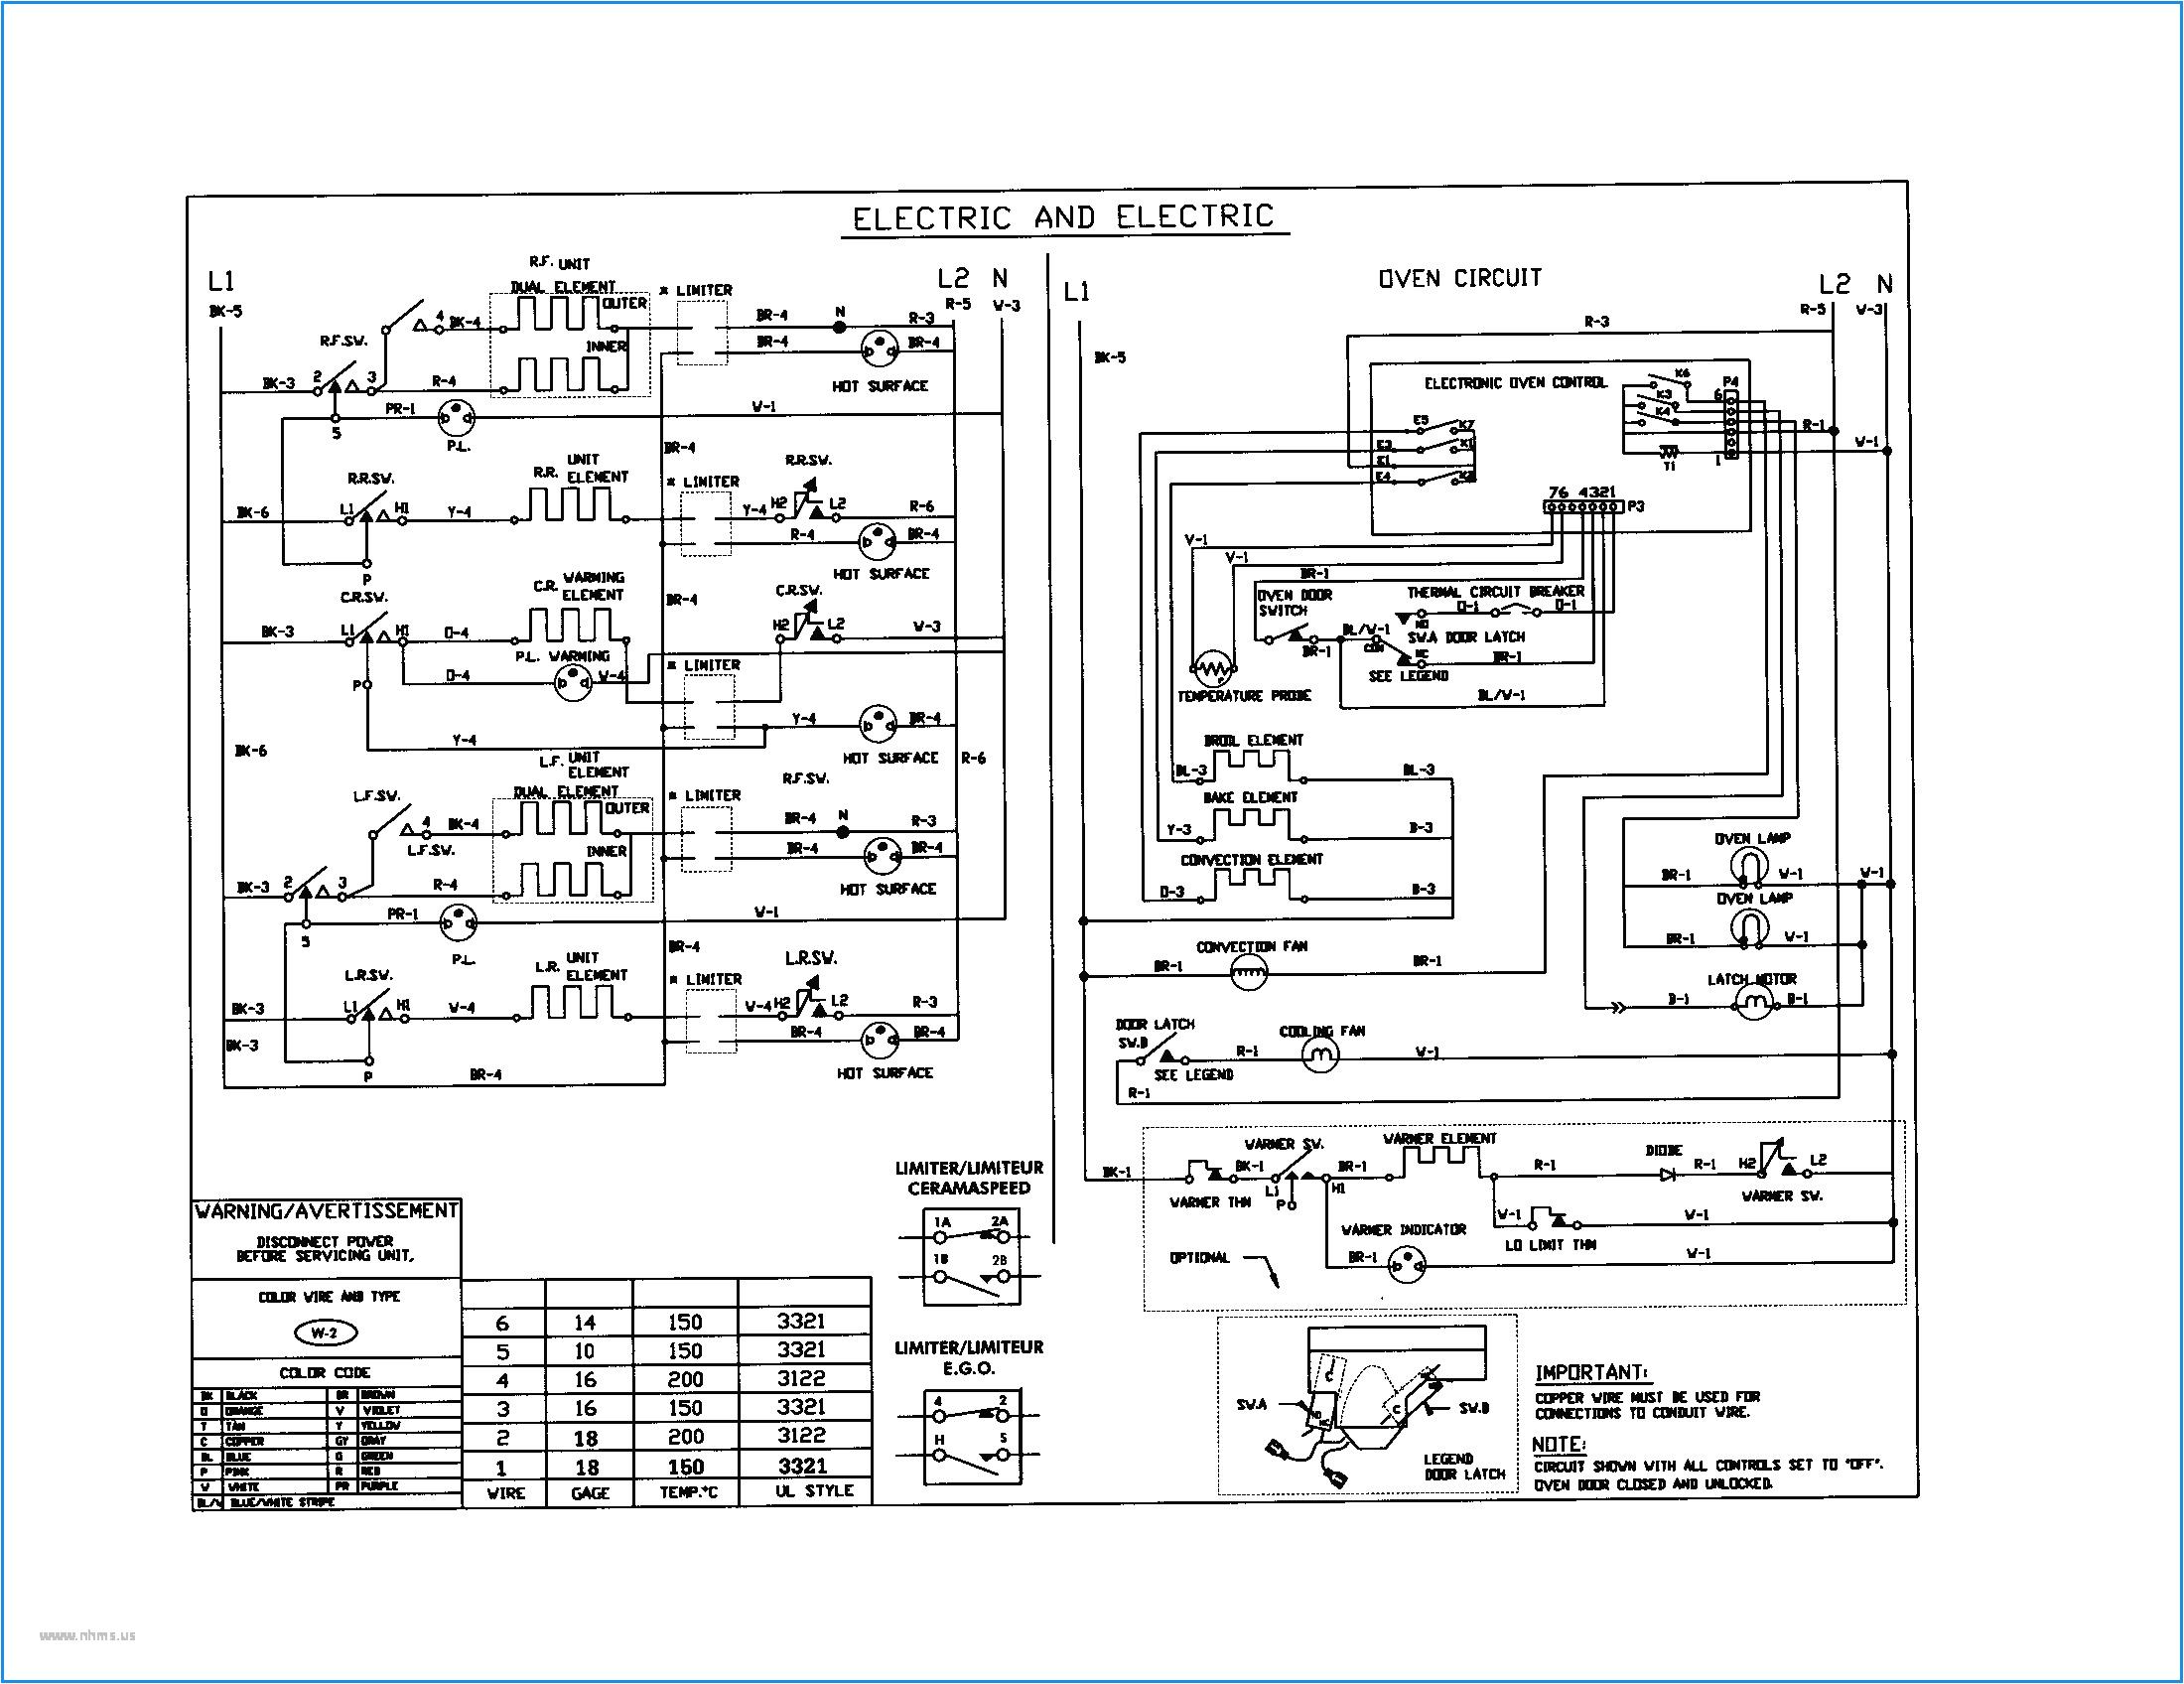 kenmore oasis dryer wiring diagram wiring diagrams konsultkenmore elite dryer wire diagram wiring diagram forward kenmore